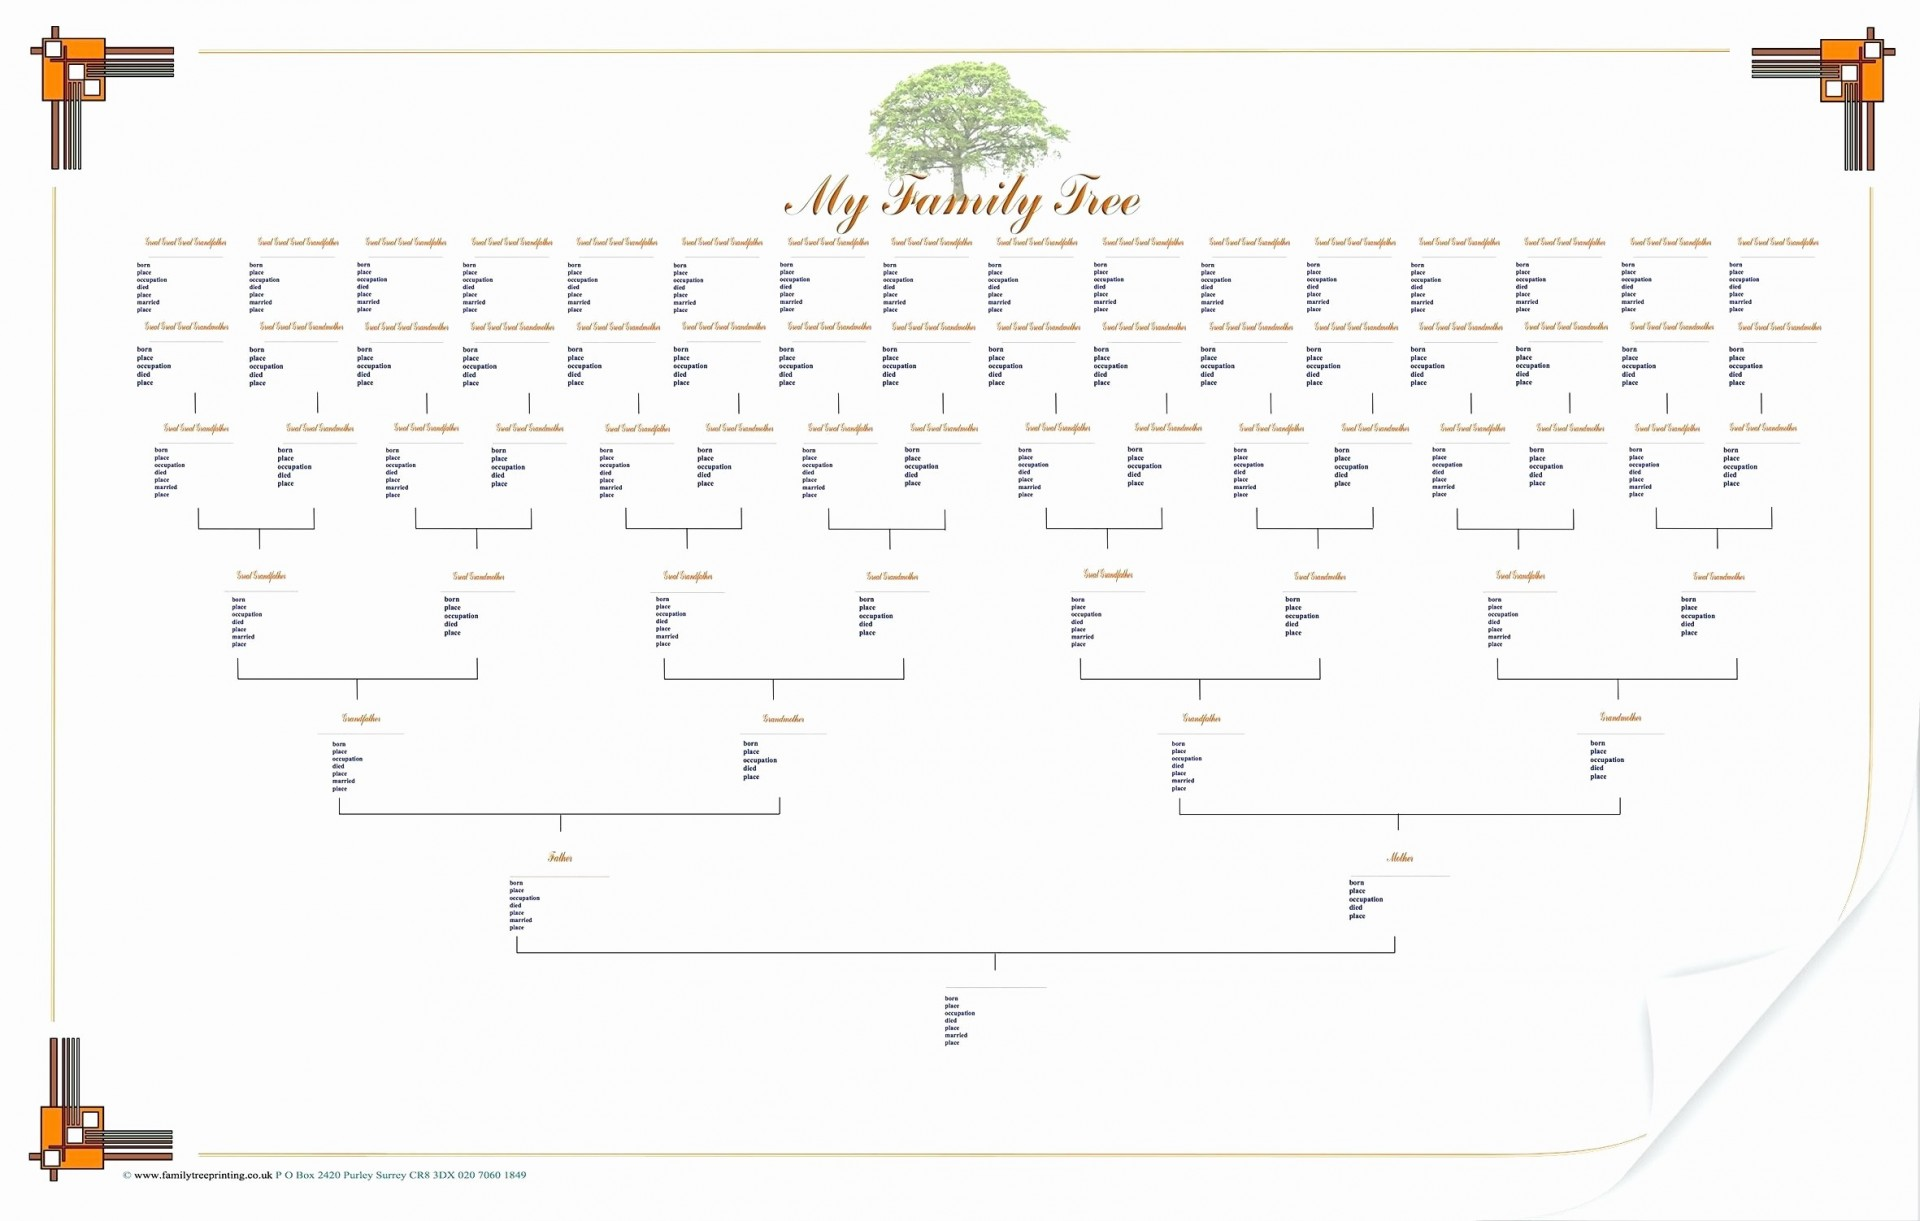 005 Shocking 7 Generation Family Tree Template Inspiration  Blank Free Editable1920